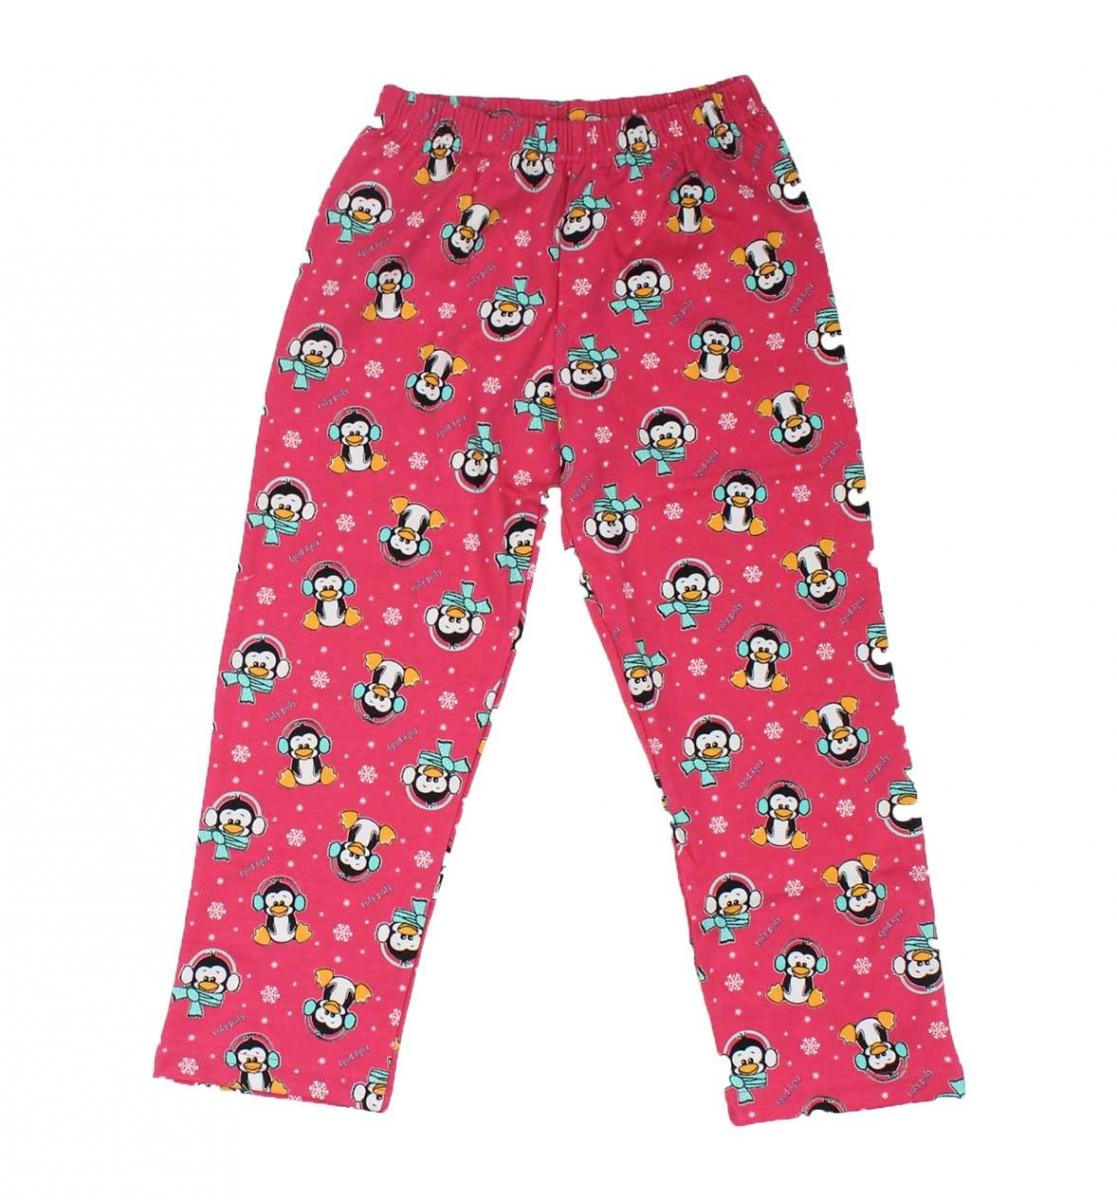 Rolypoly Kız Çocuk Pijama Takım 044-2765-040